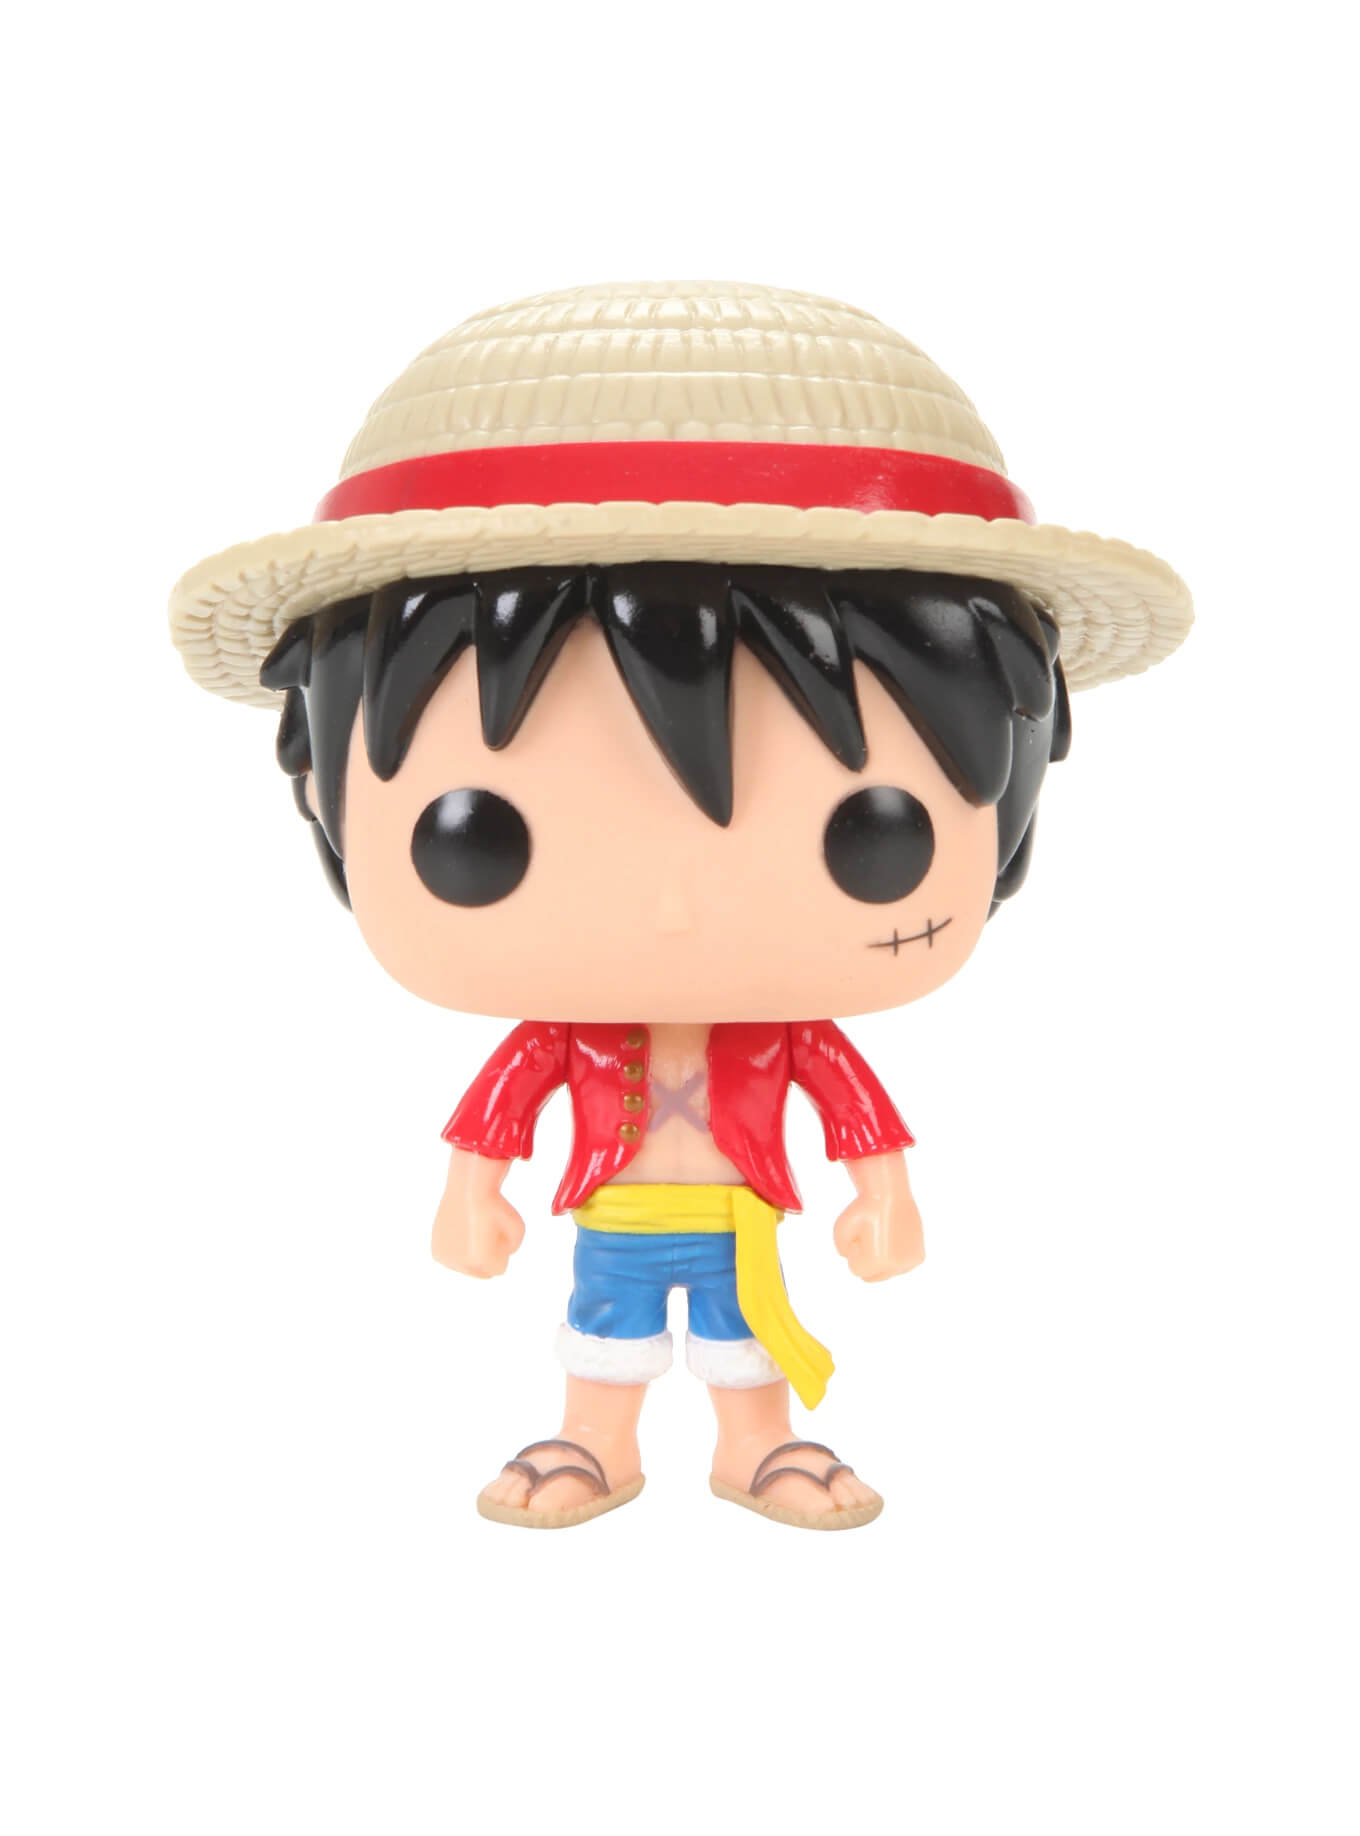 Monkey D. Luffy #98 - One Piece - Funko Pop! Animation